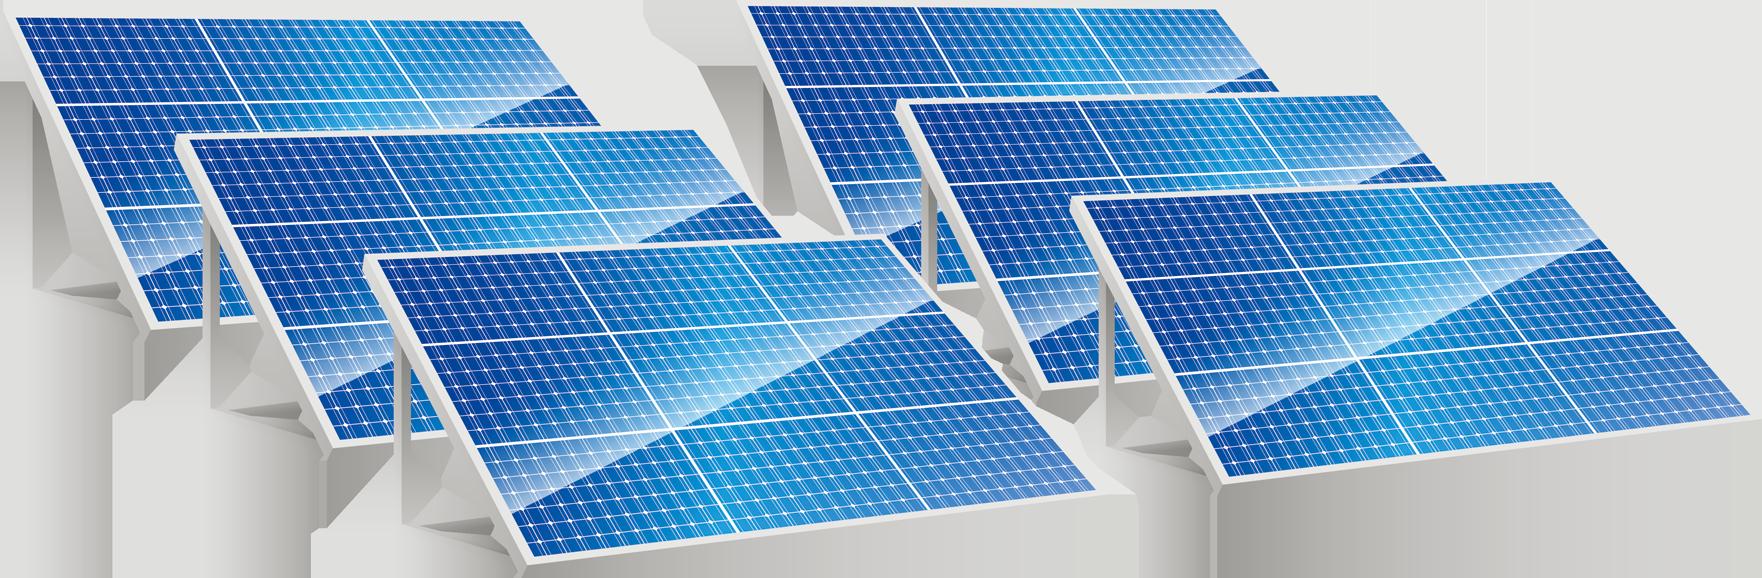 Solar Panel Array, Solar Panels, YSG Solar